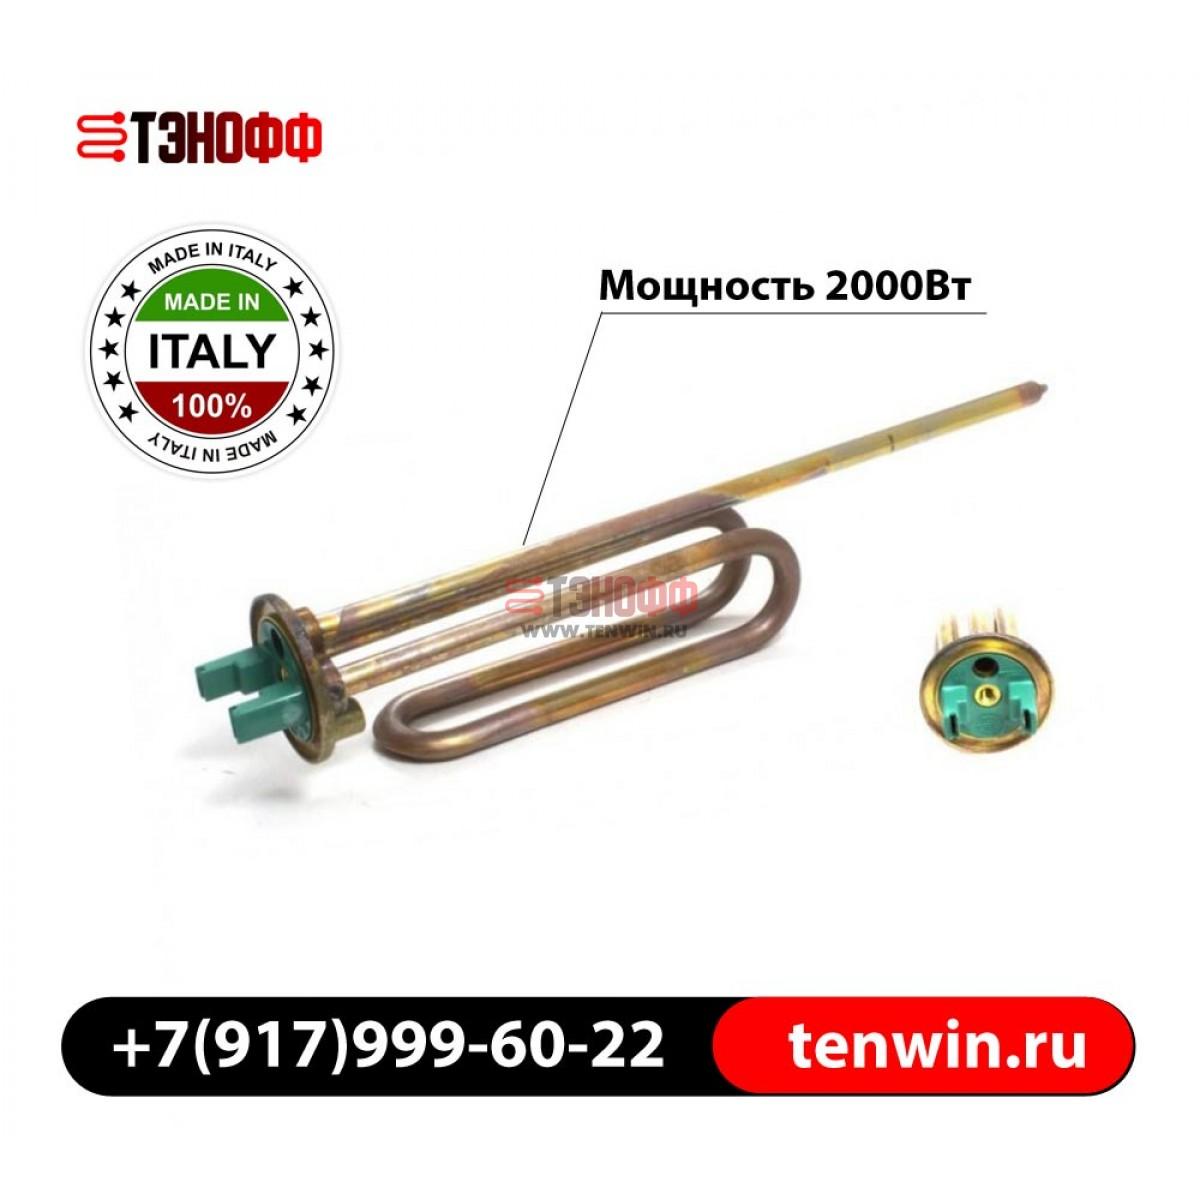 ТЭН 2000Вт Ariston водонагревателя